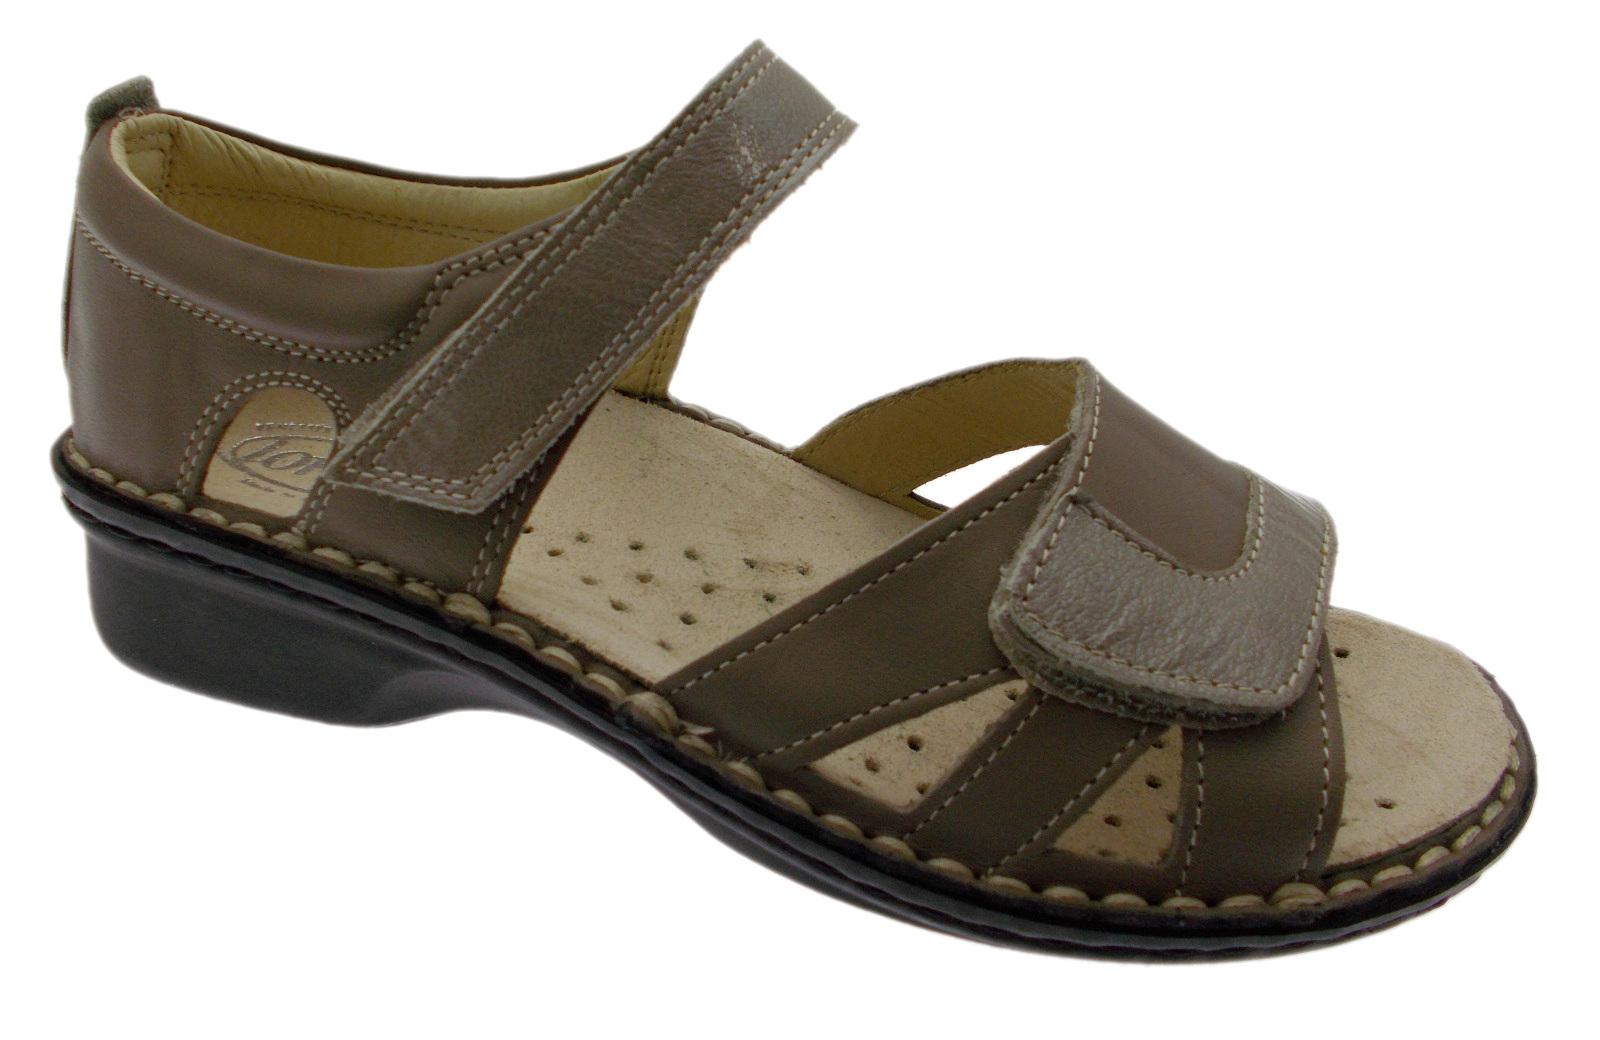 Ancient Greek sandals Sandali Leo Romani Sandali sandals Sandali 39 6167c4